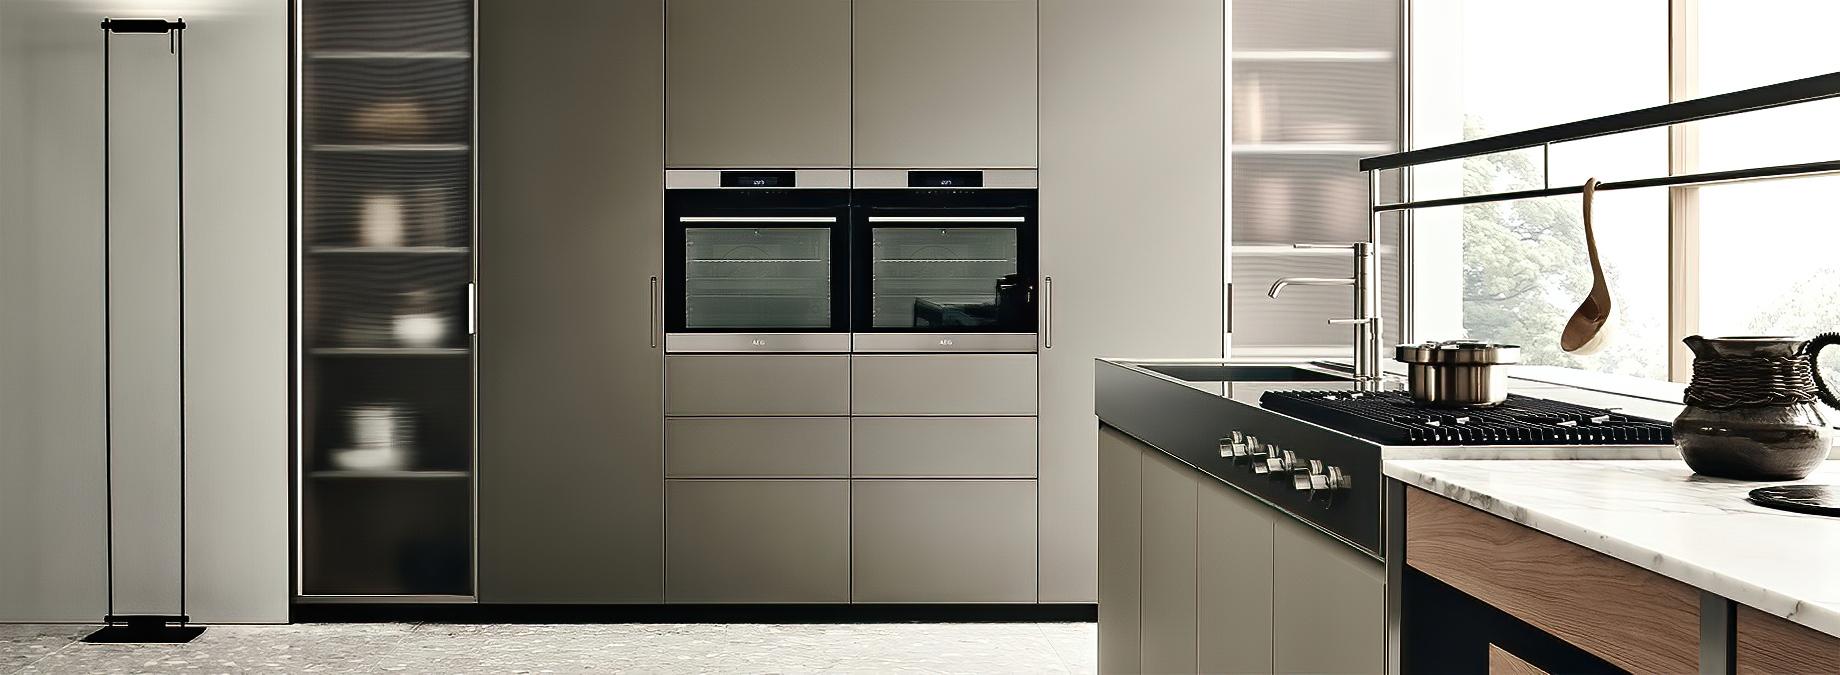 K-lab Contemporary Kitchen Ernestomeda Italy – Giuseppe Bavuso – METALLIX